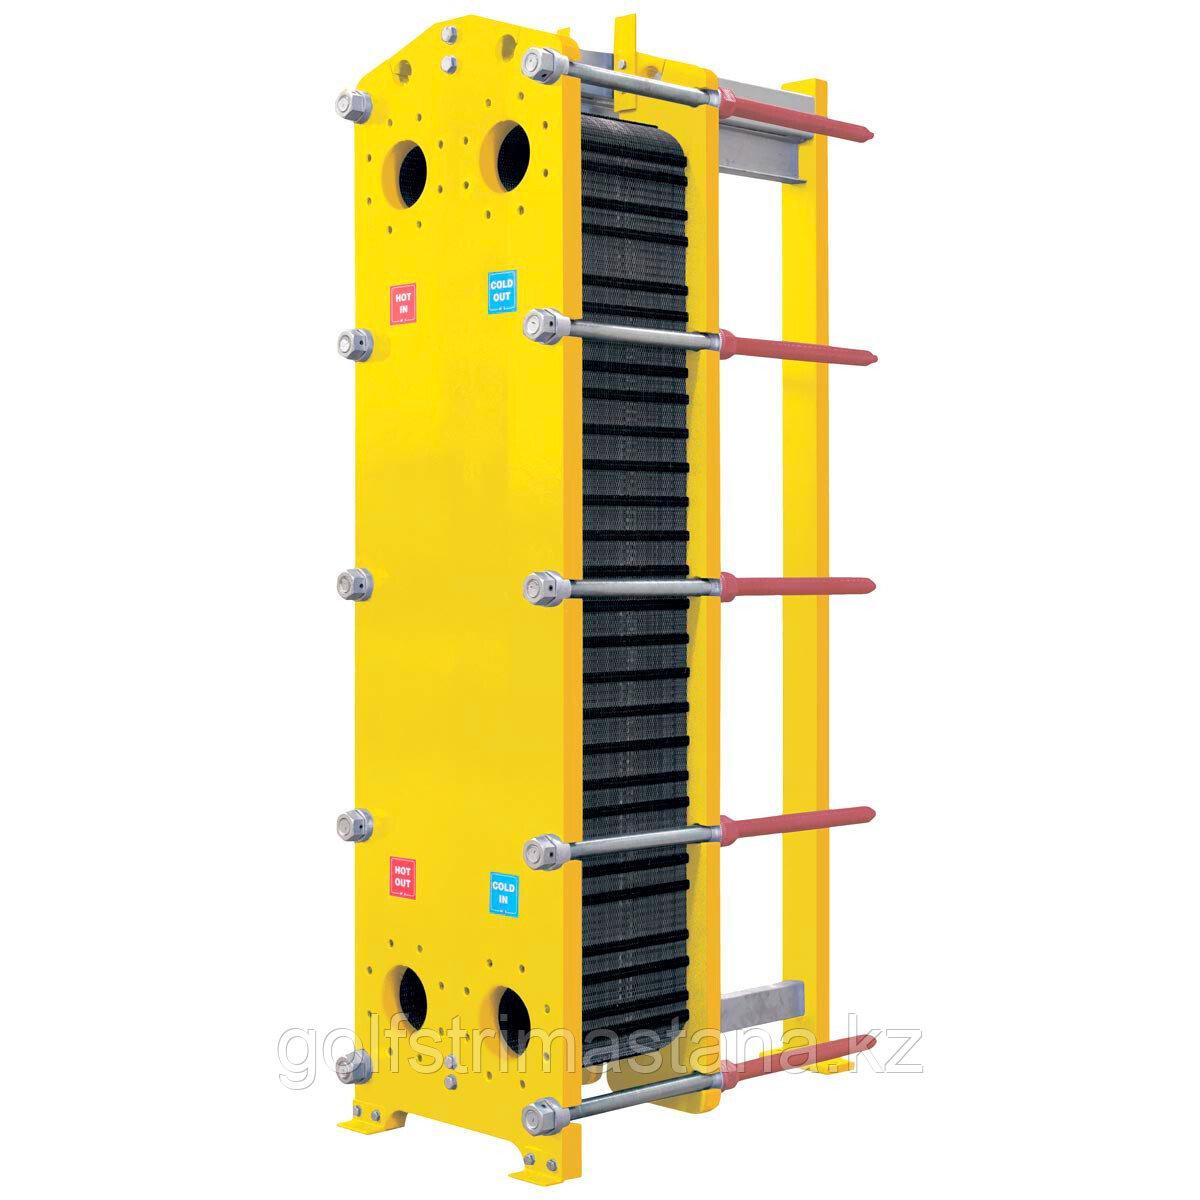 Теплообменник пластинчатый Aquaviva 446 кВт, AISI 316L